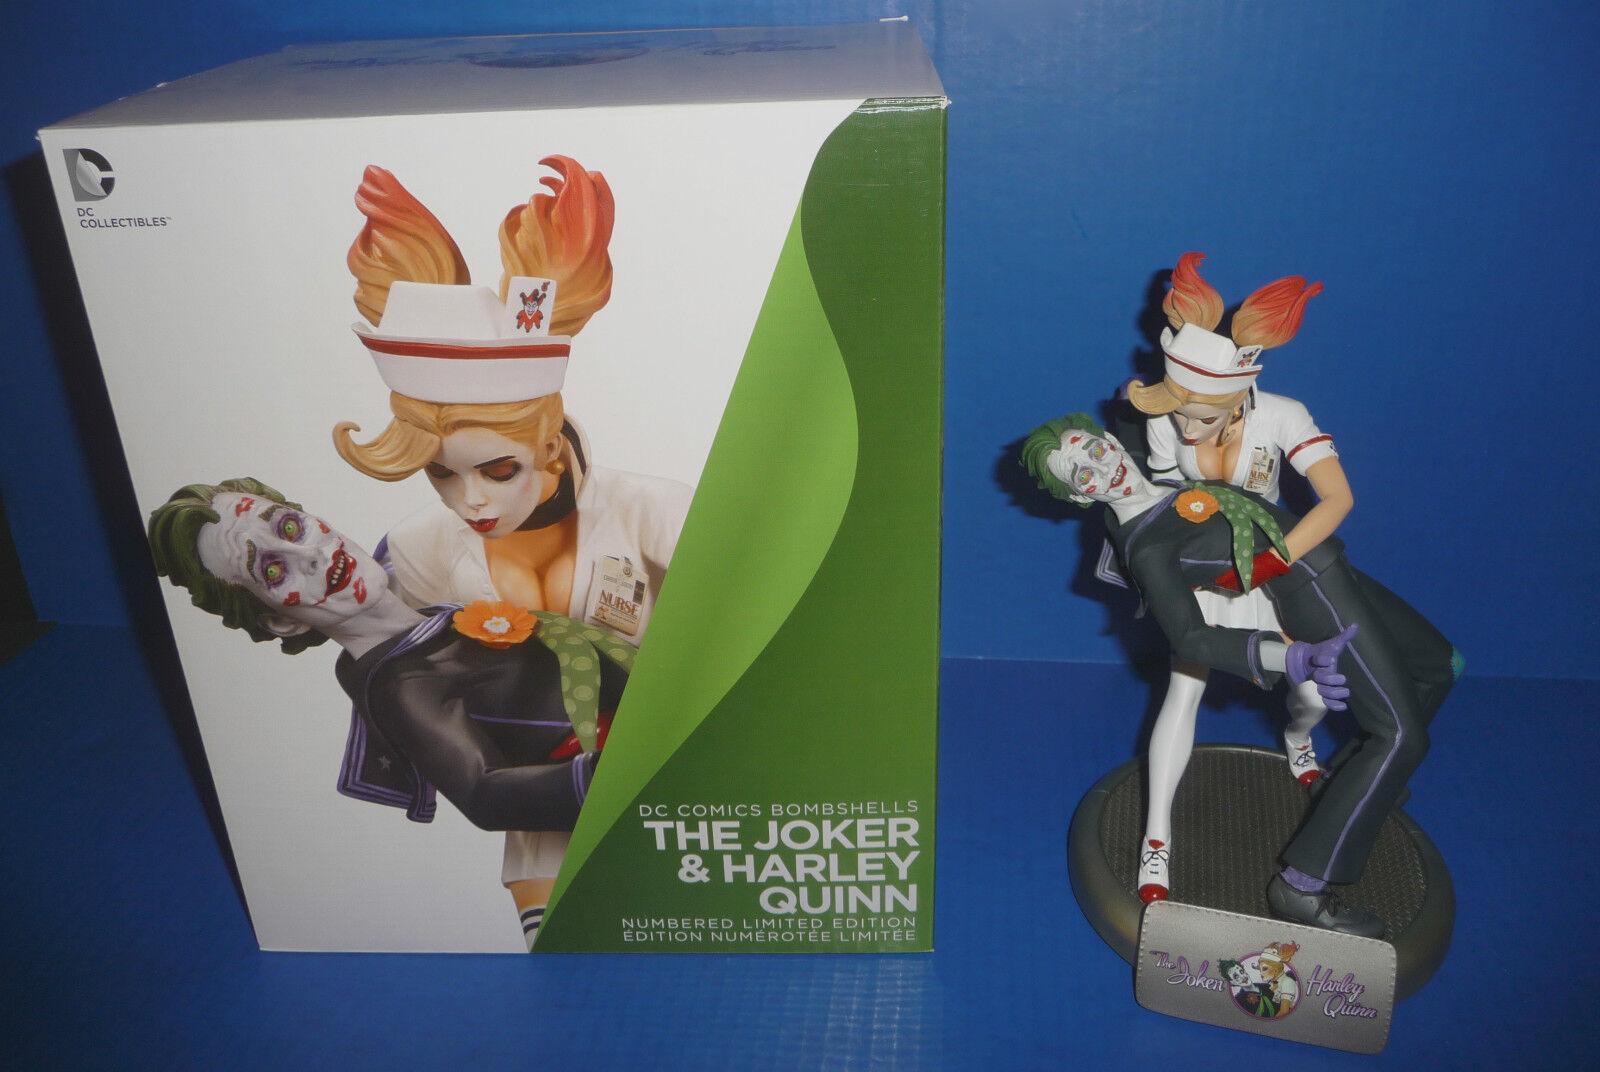 Batman DC Comics Bombshells Joker and Harley Quinn Statue 1st Edition Read Below